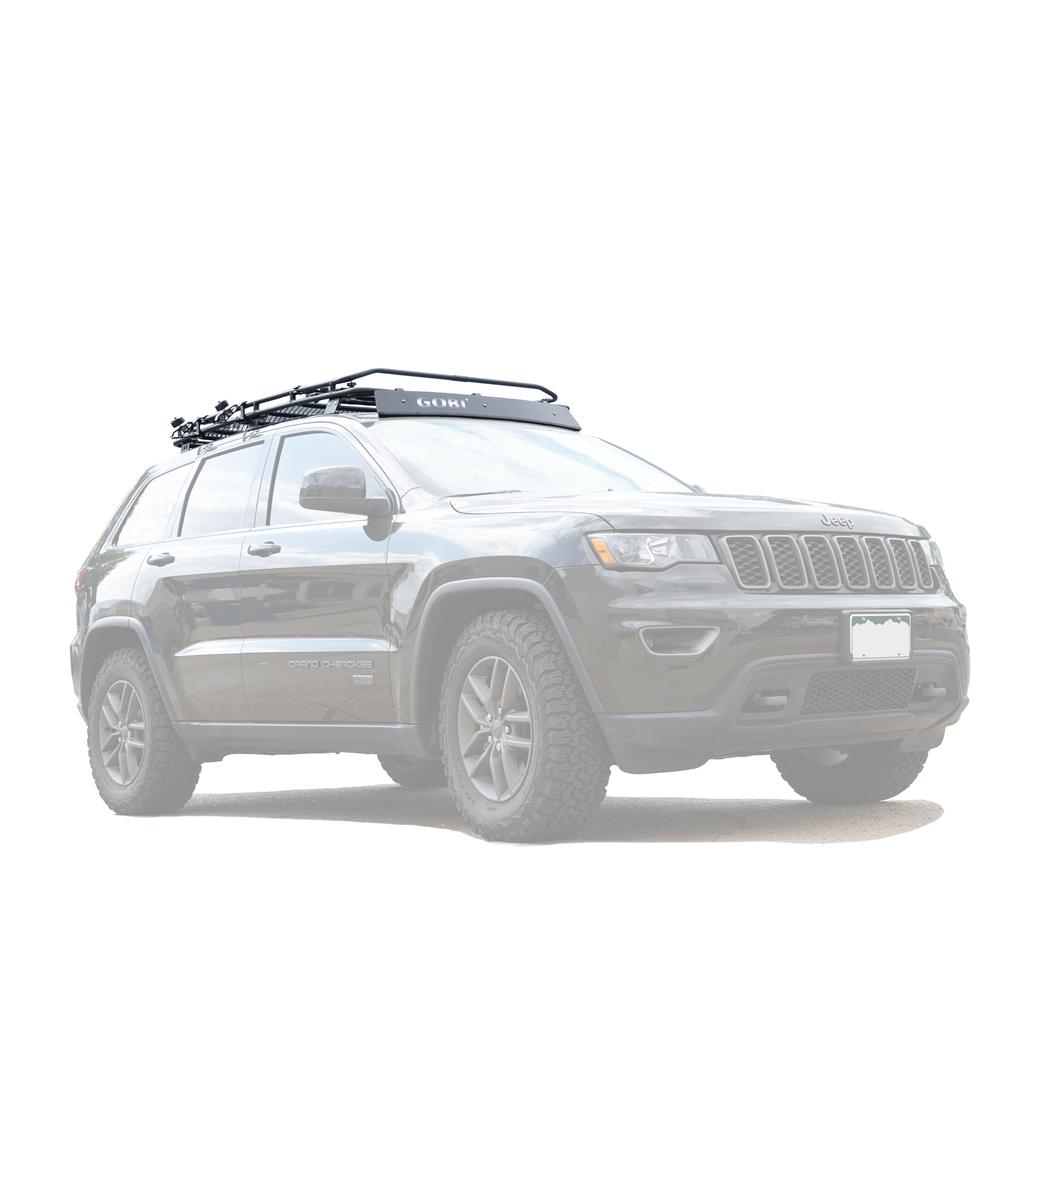 Gobi Jeep Grand Cherokee Wk2 Stealth Rack No Sunroof